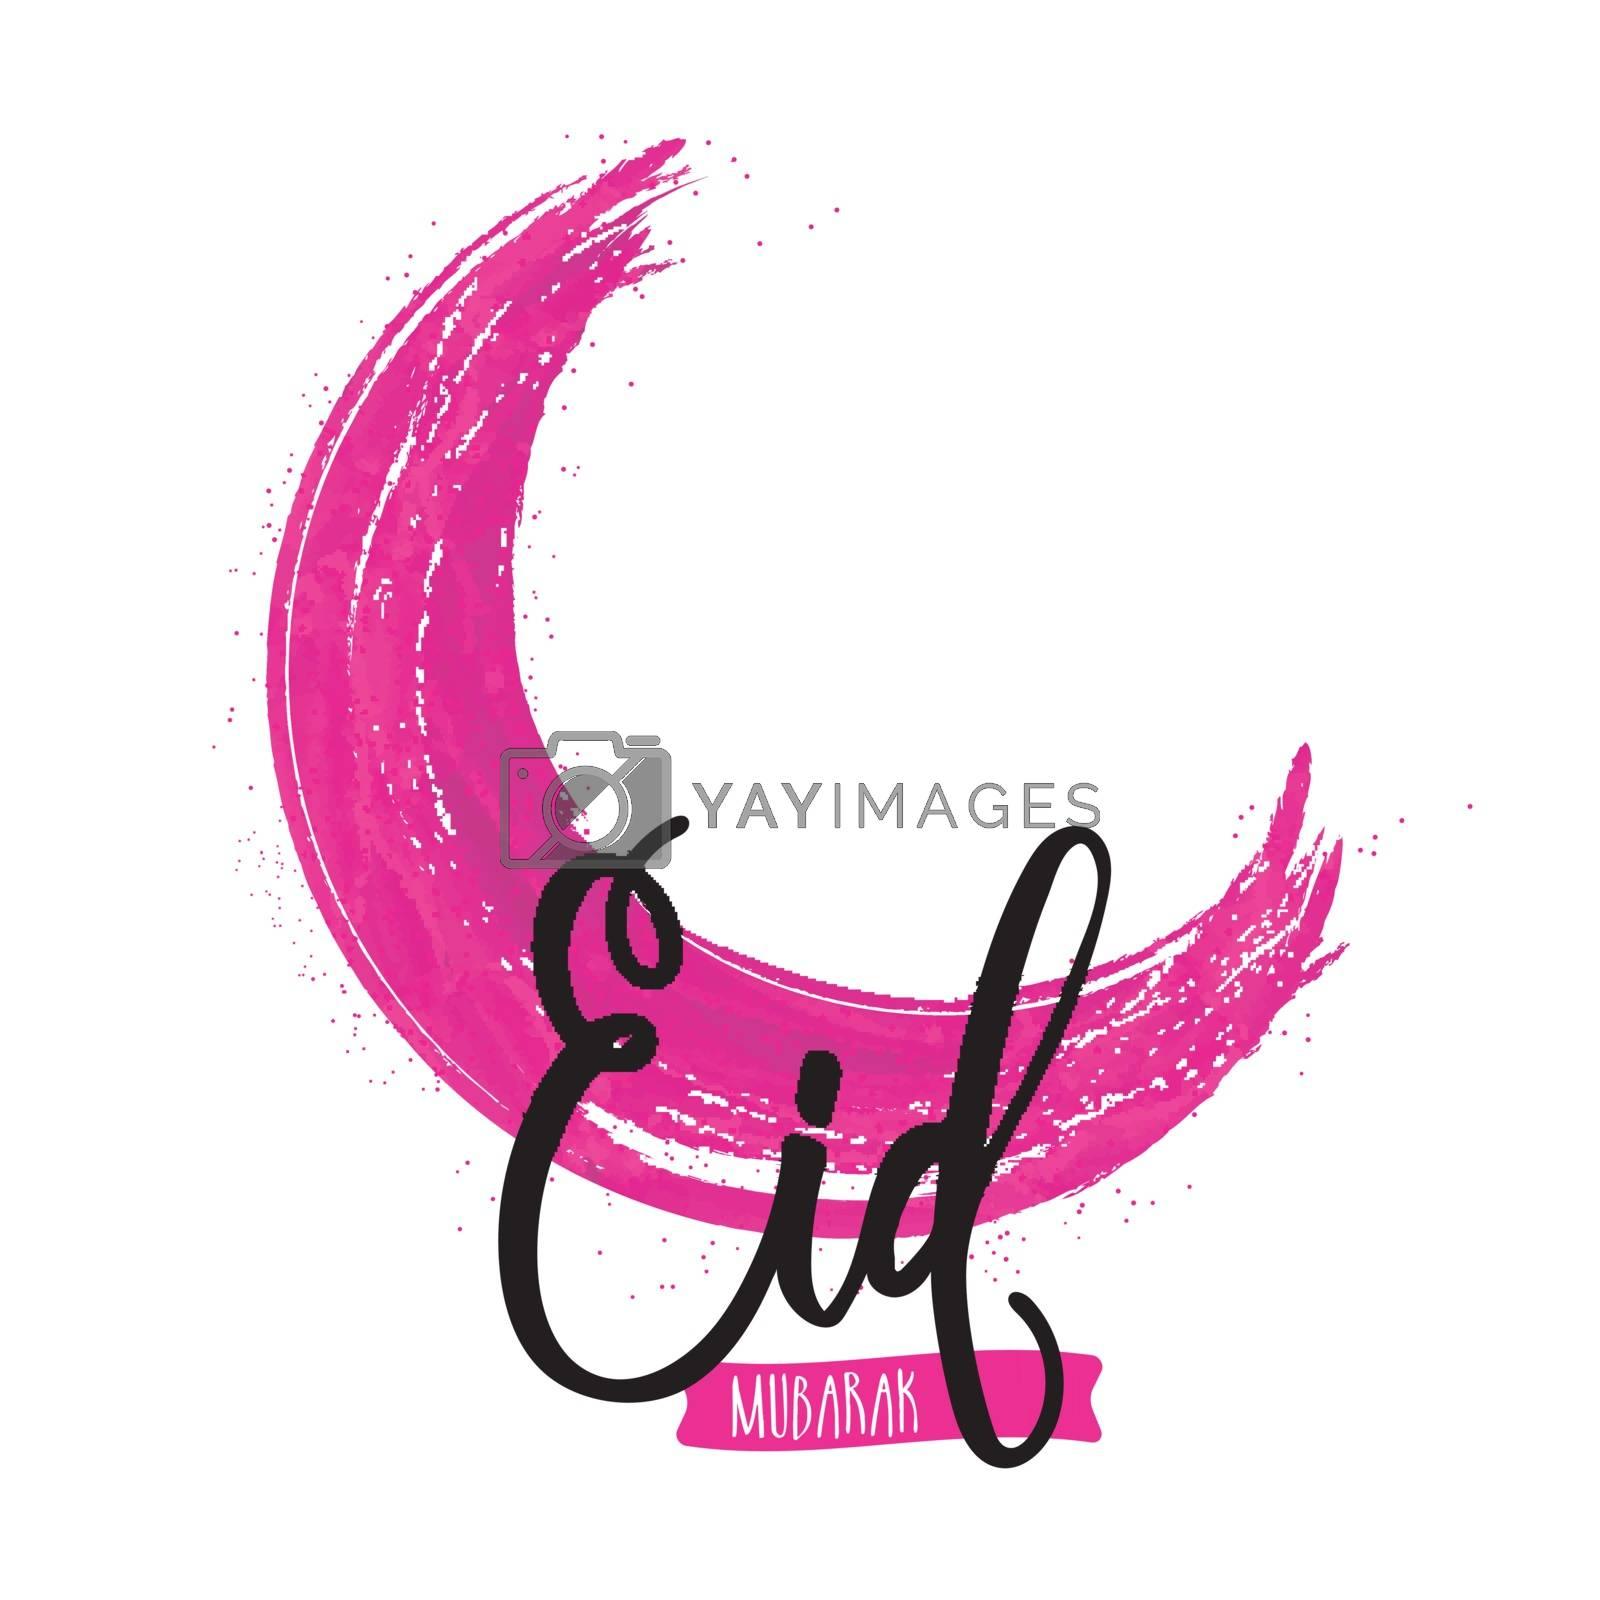 Crescent Moon made by watercolor brush stroke for Muslim Community Festival, Eid Mubarak celebration.